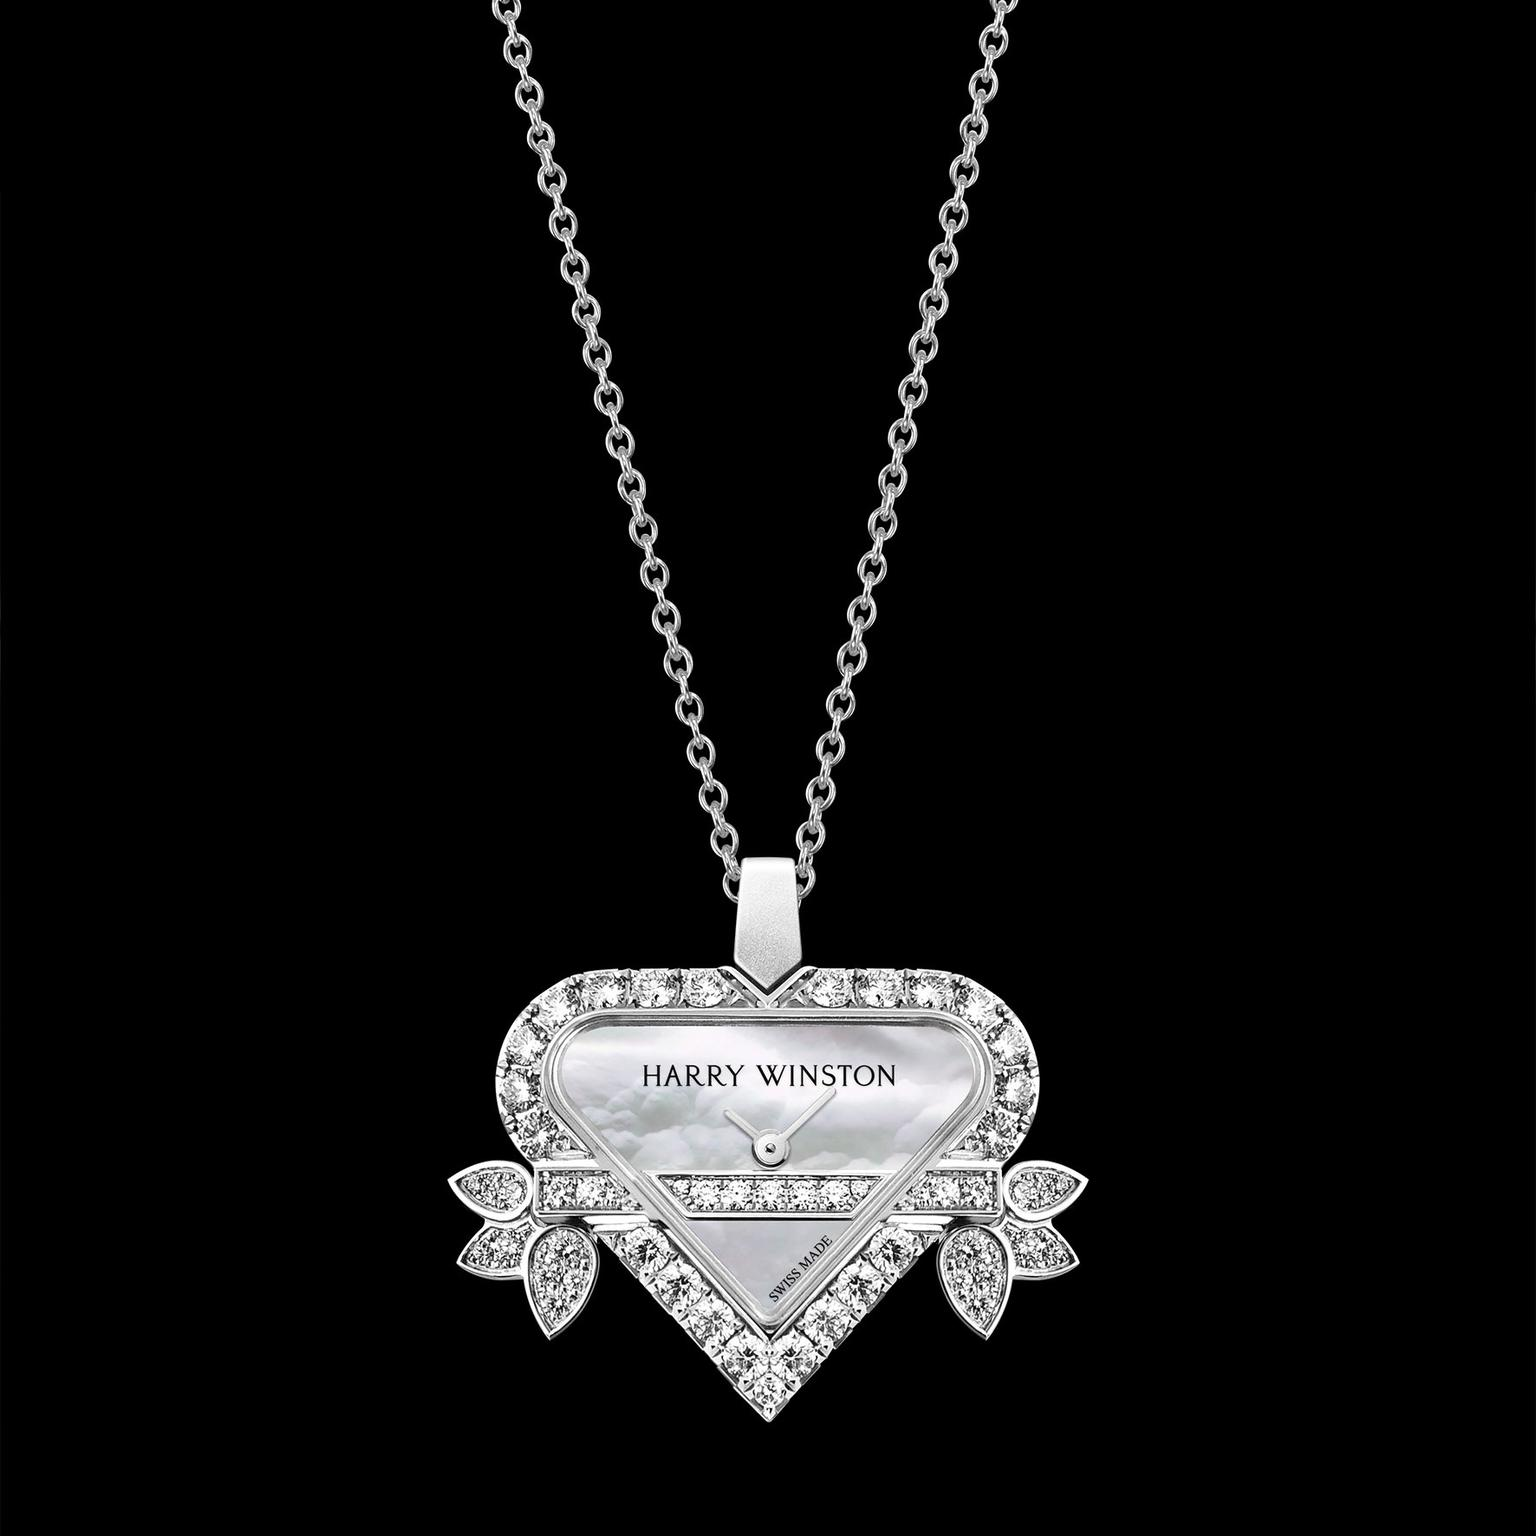 Rosebud Heart high jewellery pendant watch Harry Winston